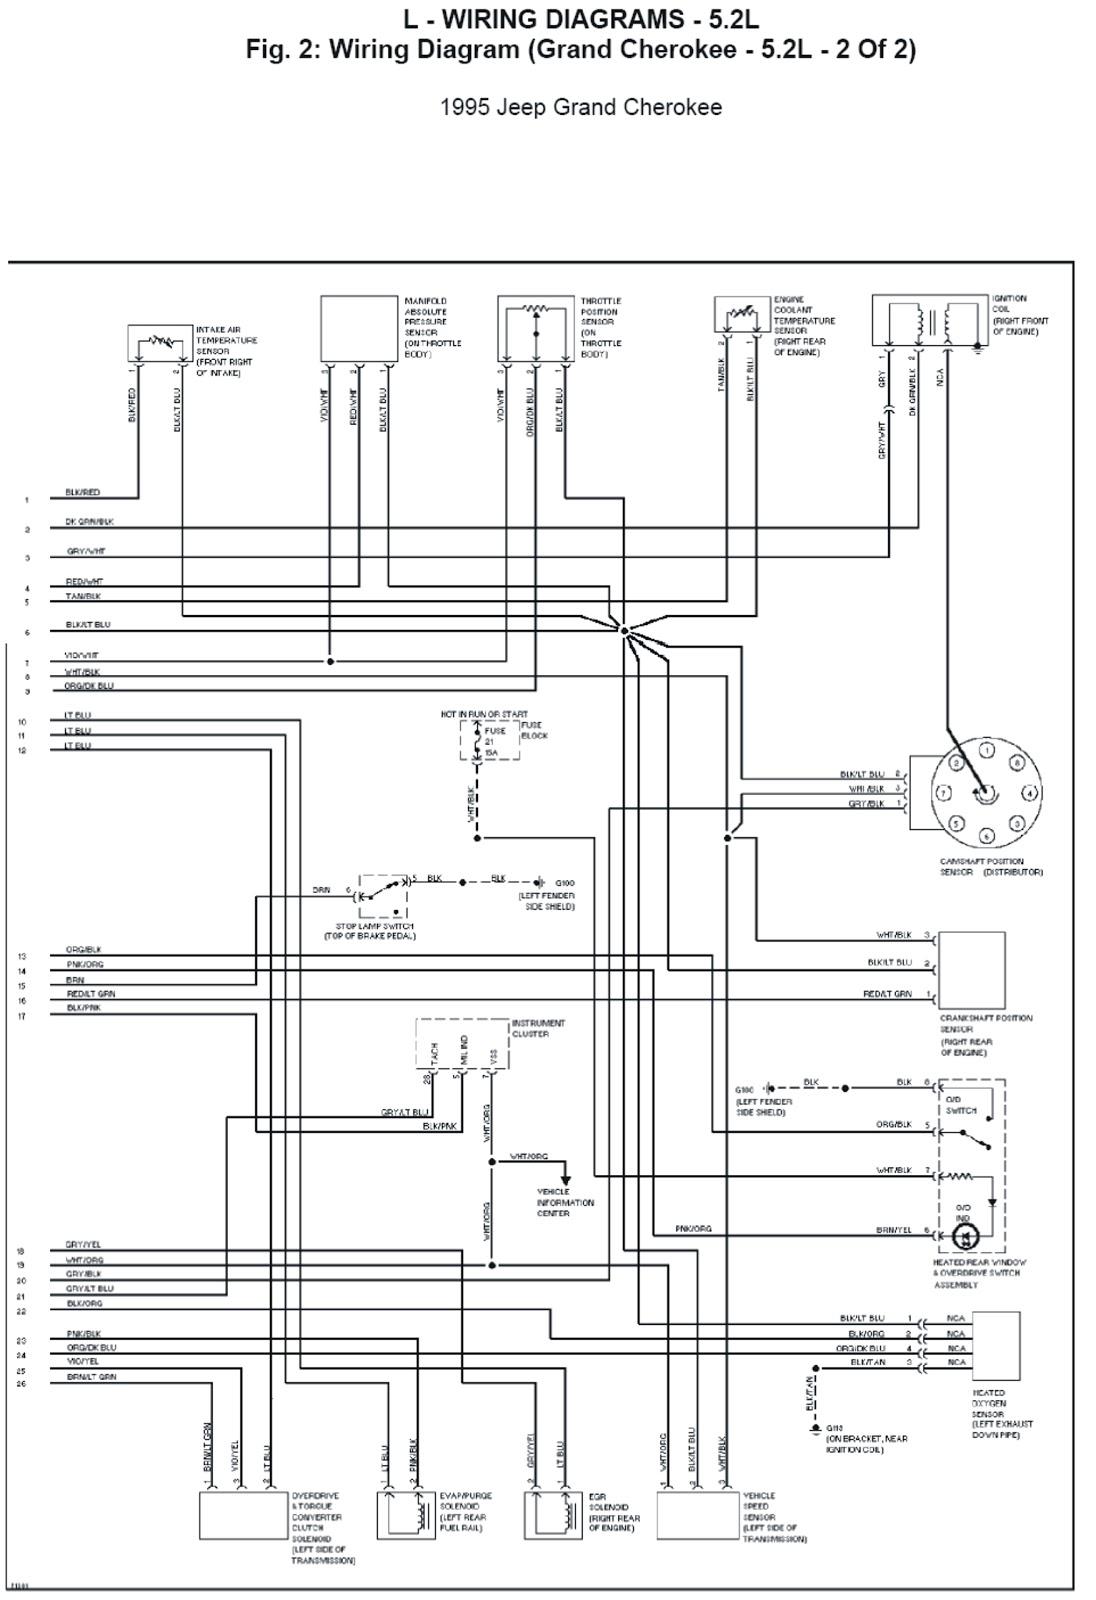 medium resolution of 93 jeep grand cherokee ignition wiring diagram radio wiring diagram 1992 jeep cherokeerh svlc